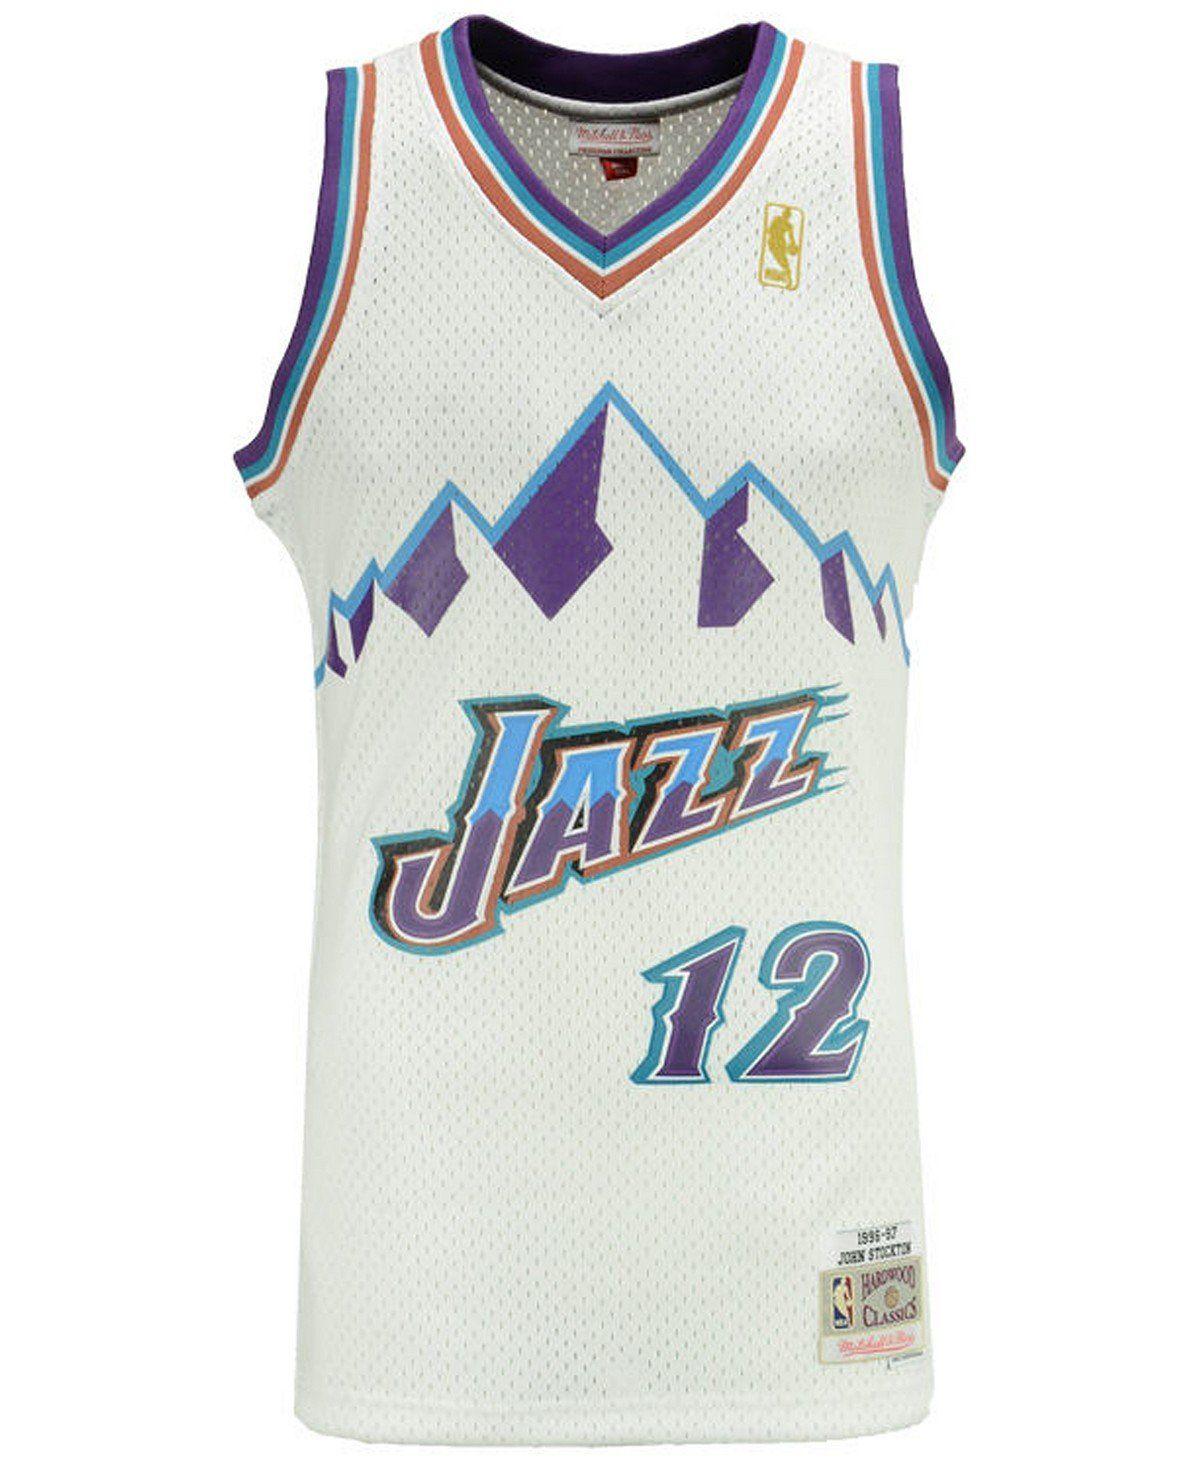 ed68f6b65318 Men s John Stockton Utah Jazz Mitchell   Ness White Throwback Swingman  Jersey